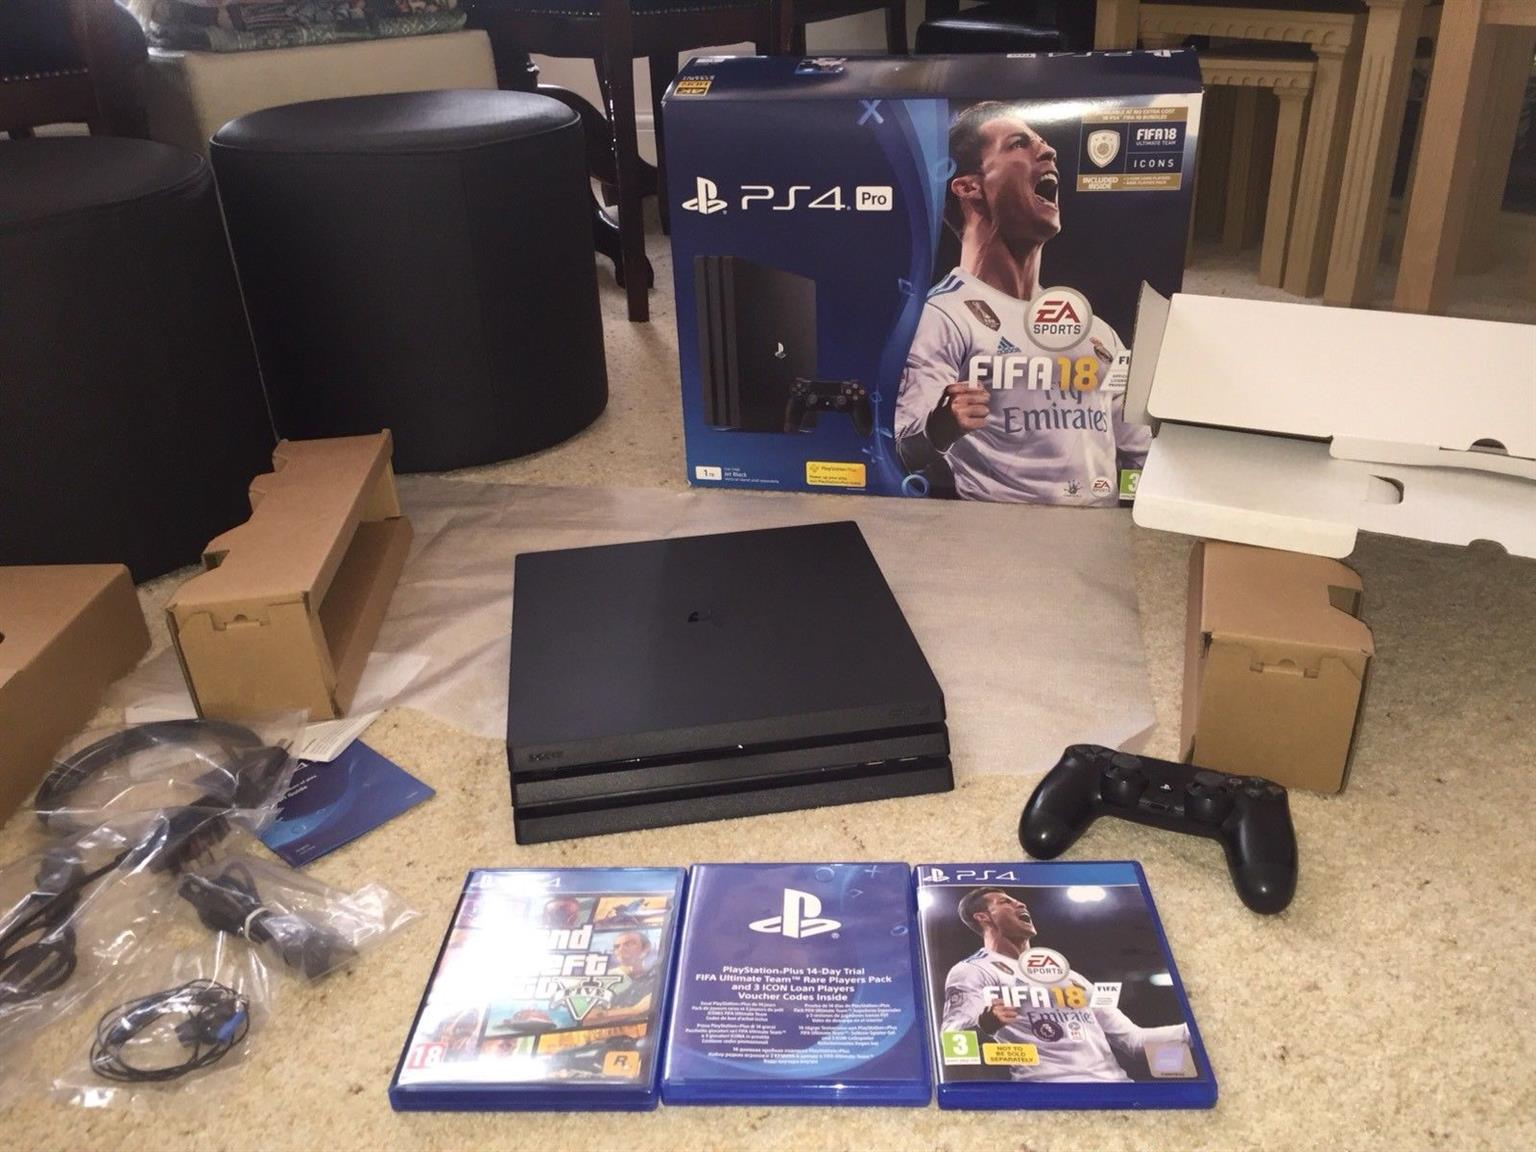 Sony Playstation 4 Pro 1tb 4k Game Console Black Junk Mail Region 3